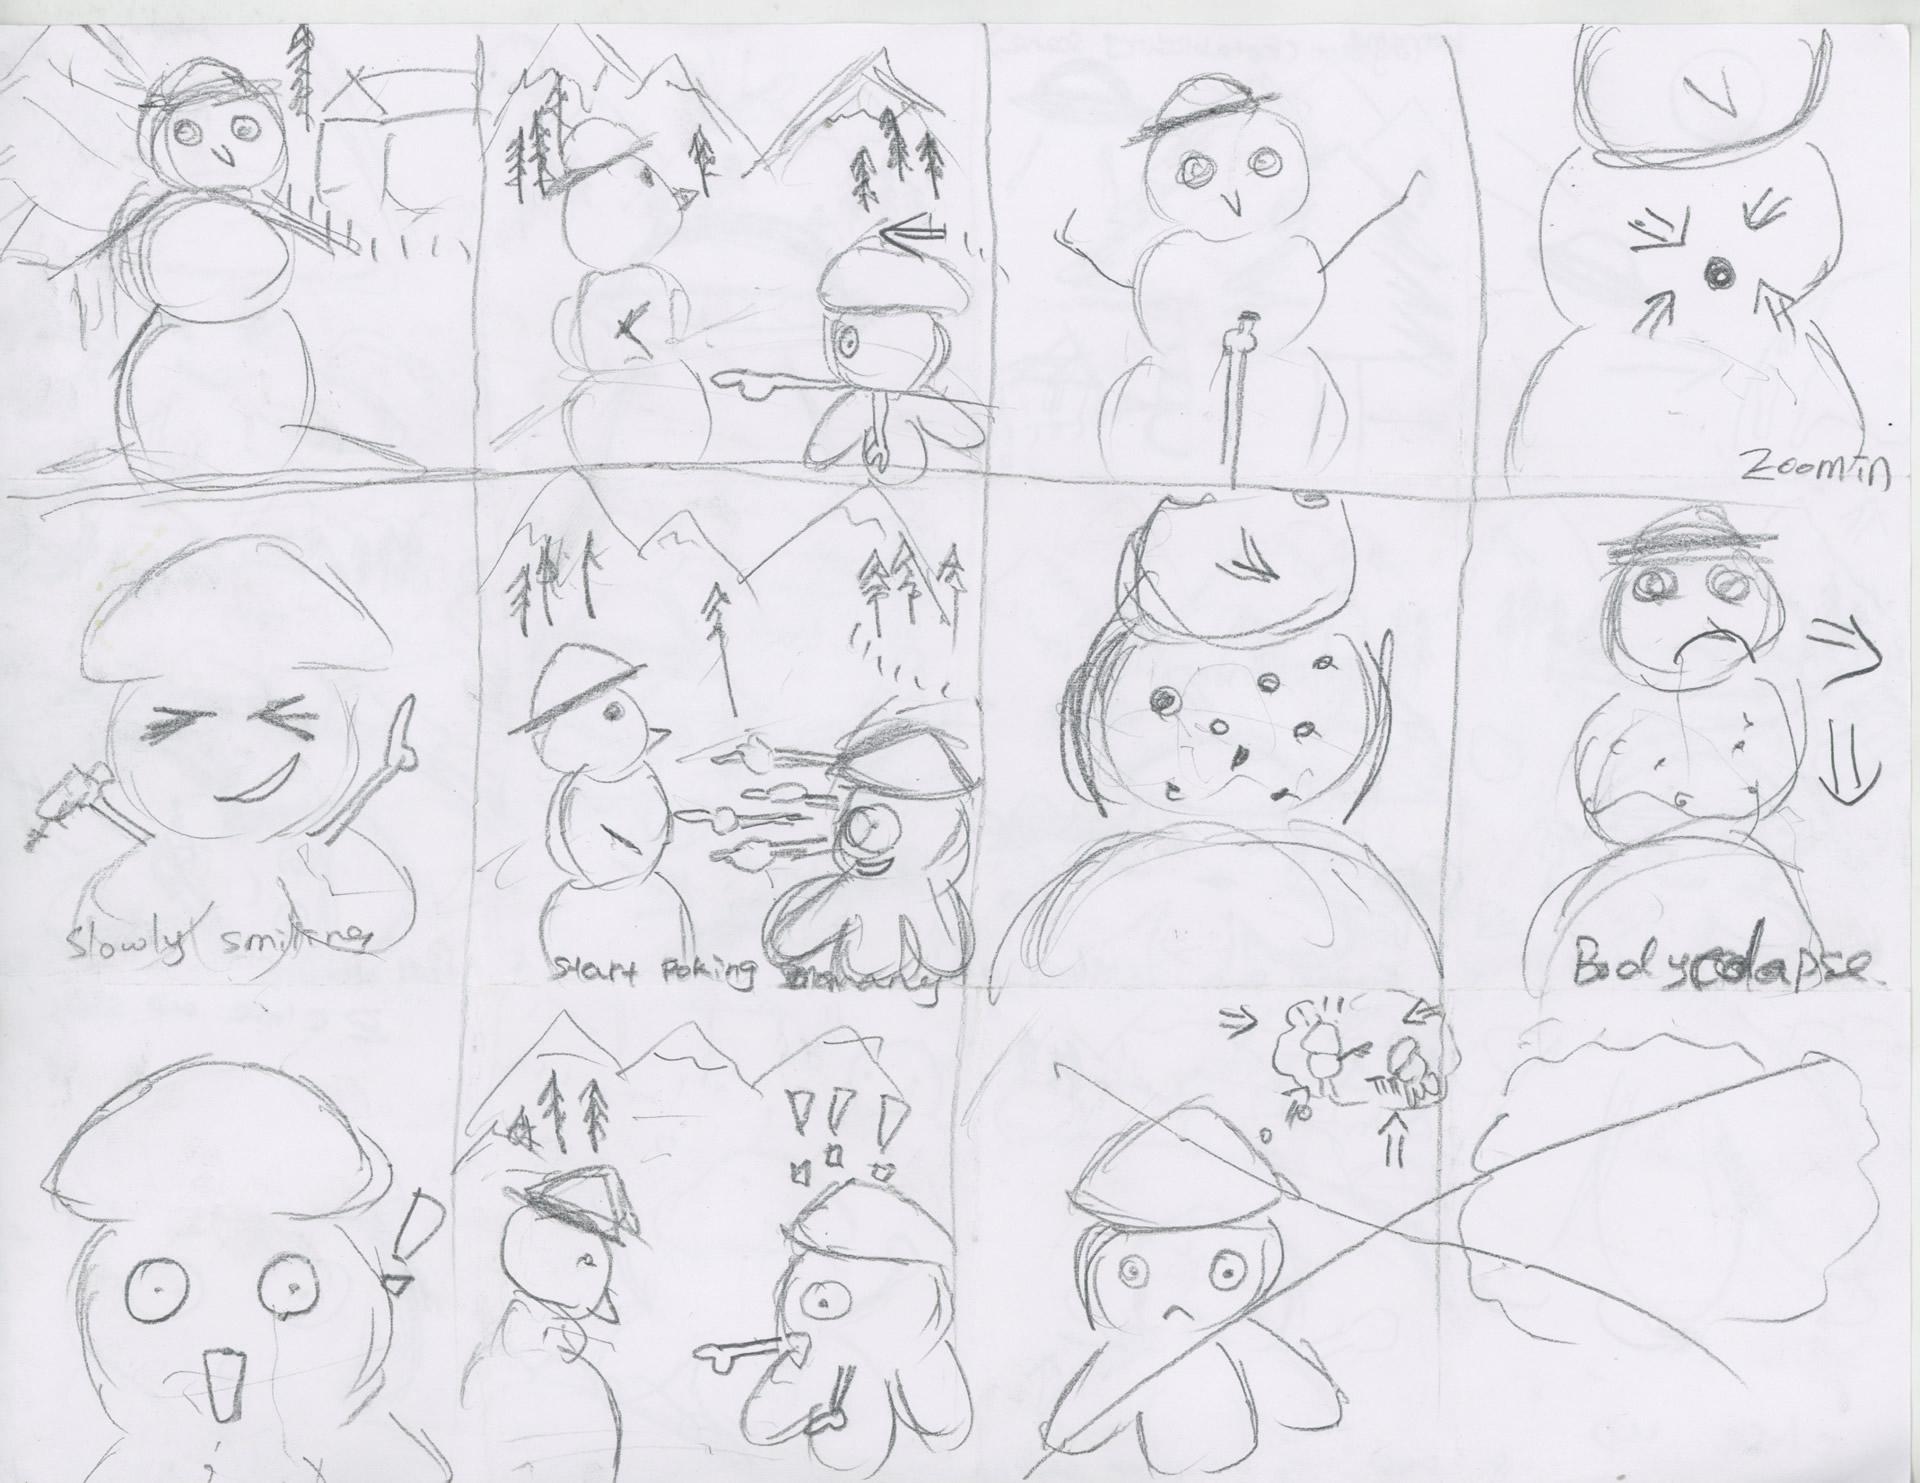 Sketch Lucky 2